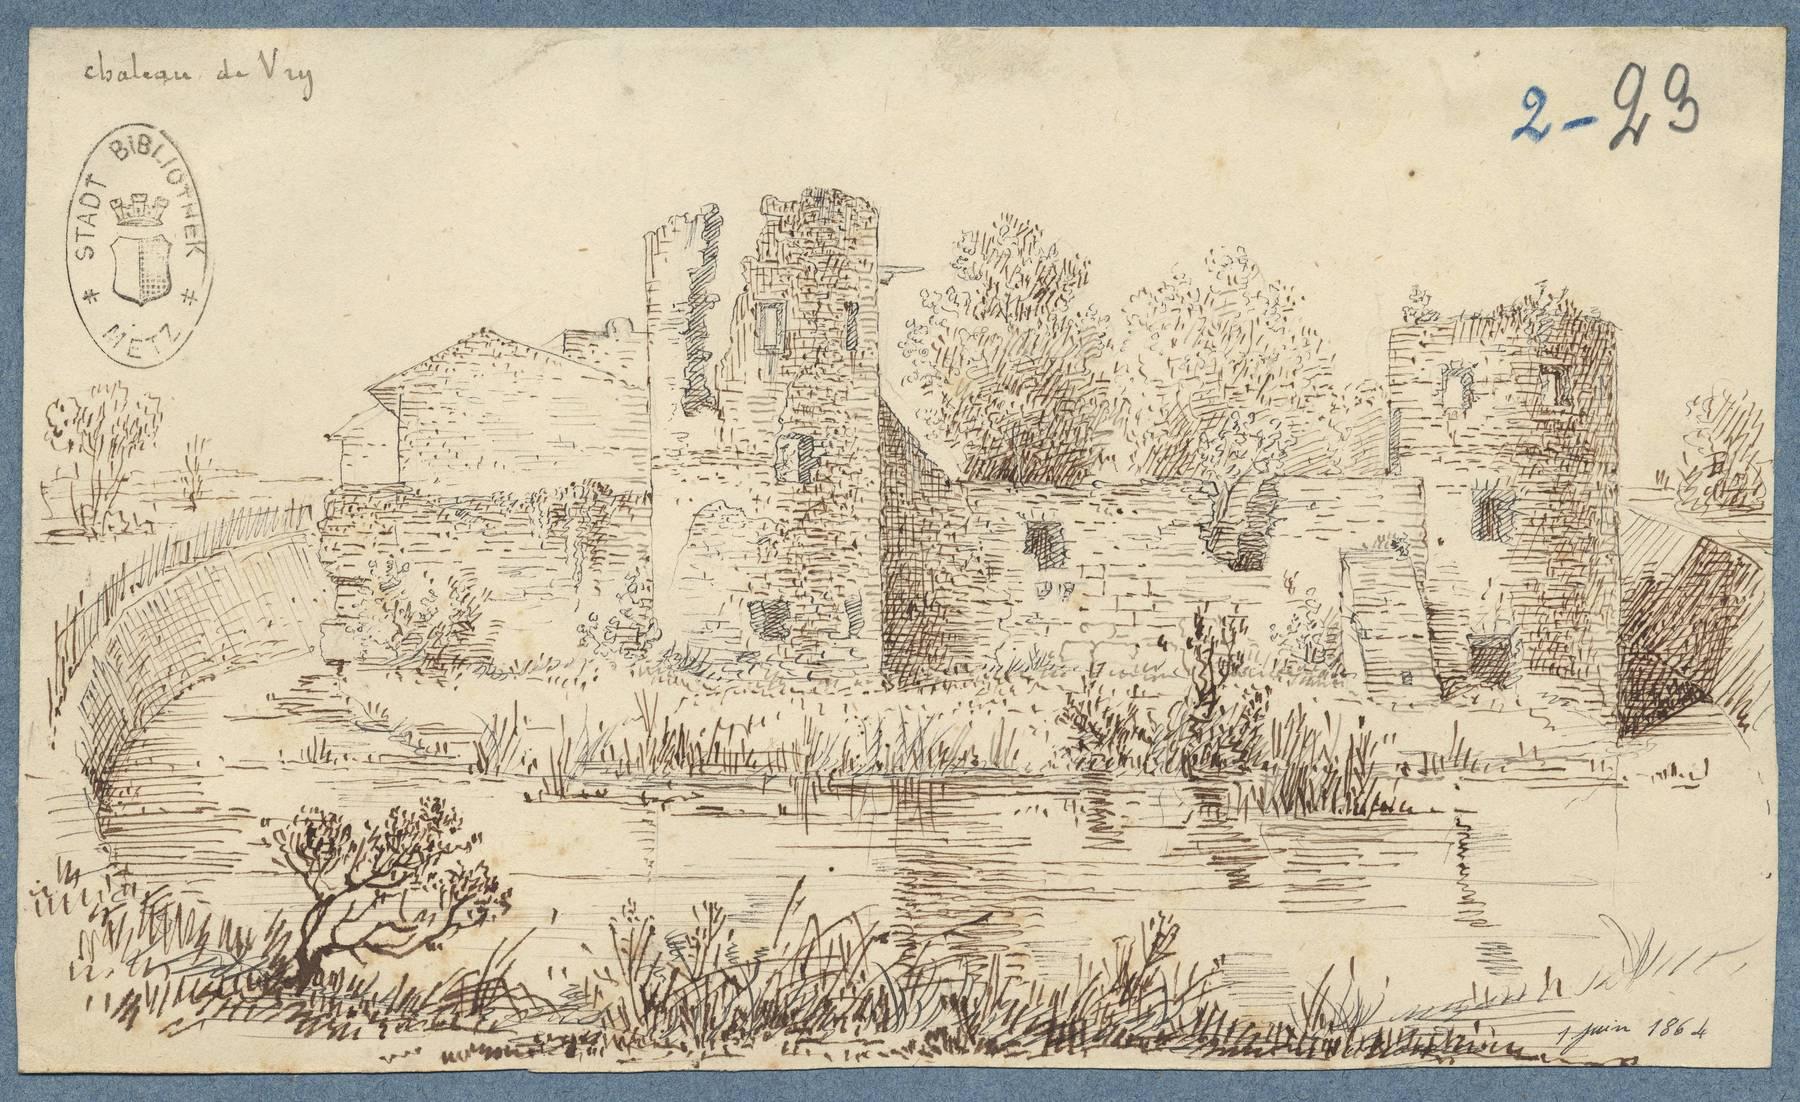 Contenu du Château de Vry